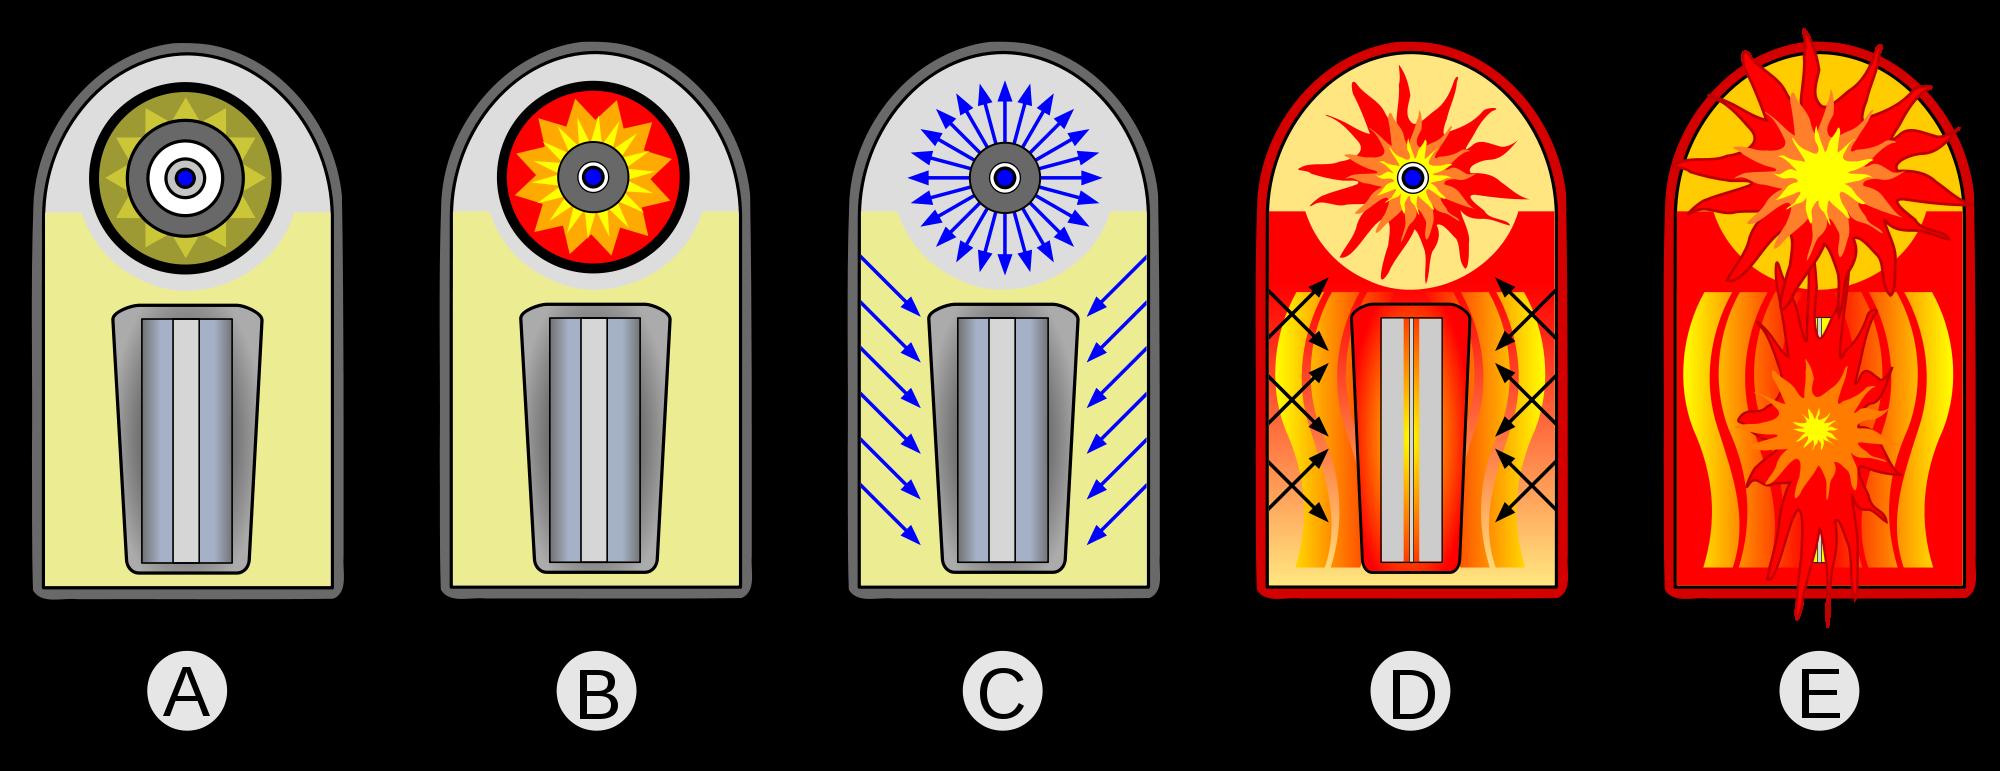 Explosion hydrogen bomb